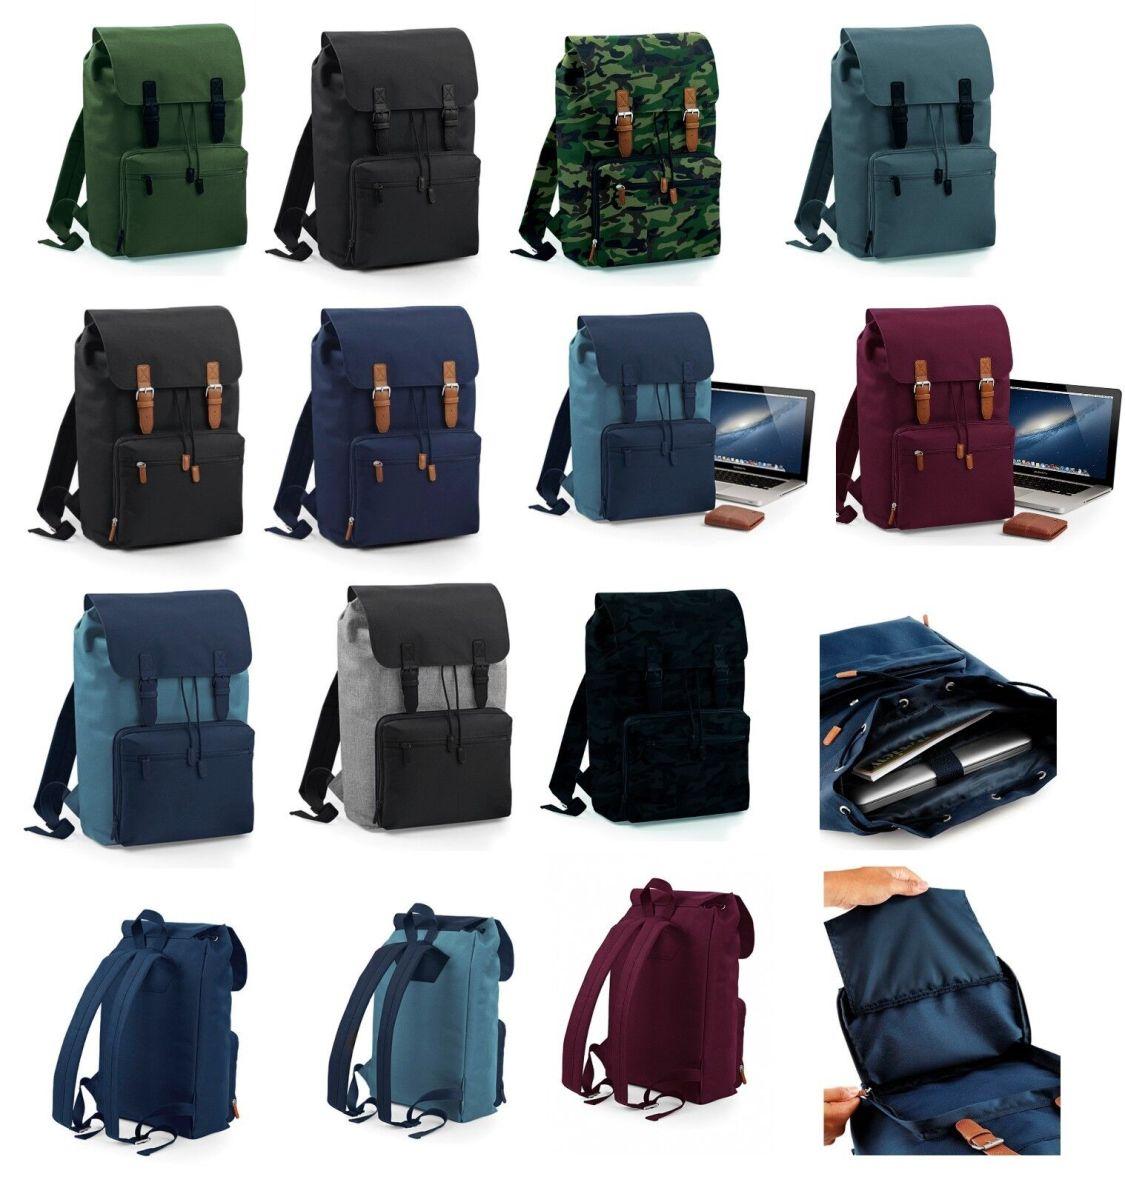 Laptop Rucksack gepolstert bis 17 Zoll Vintage Laptop Backpack Büro Schule Uni